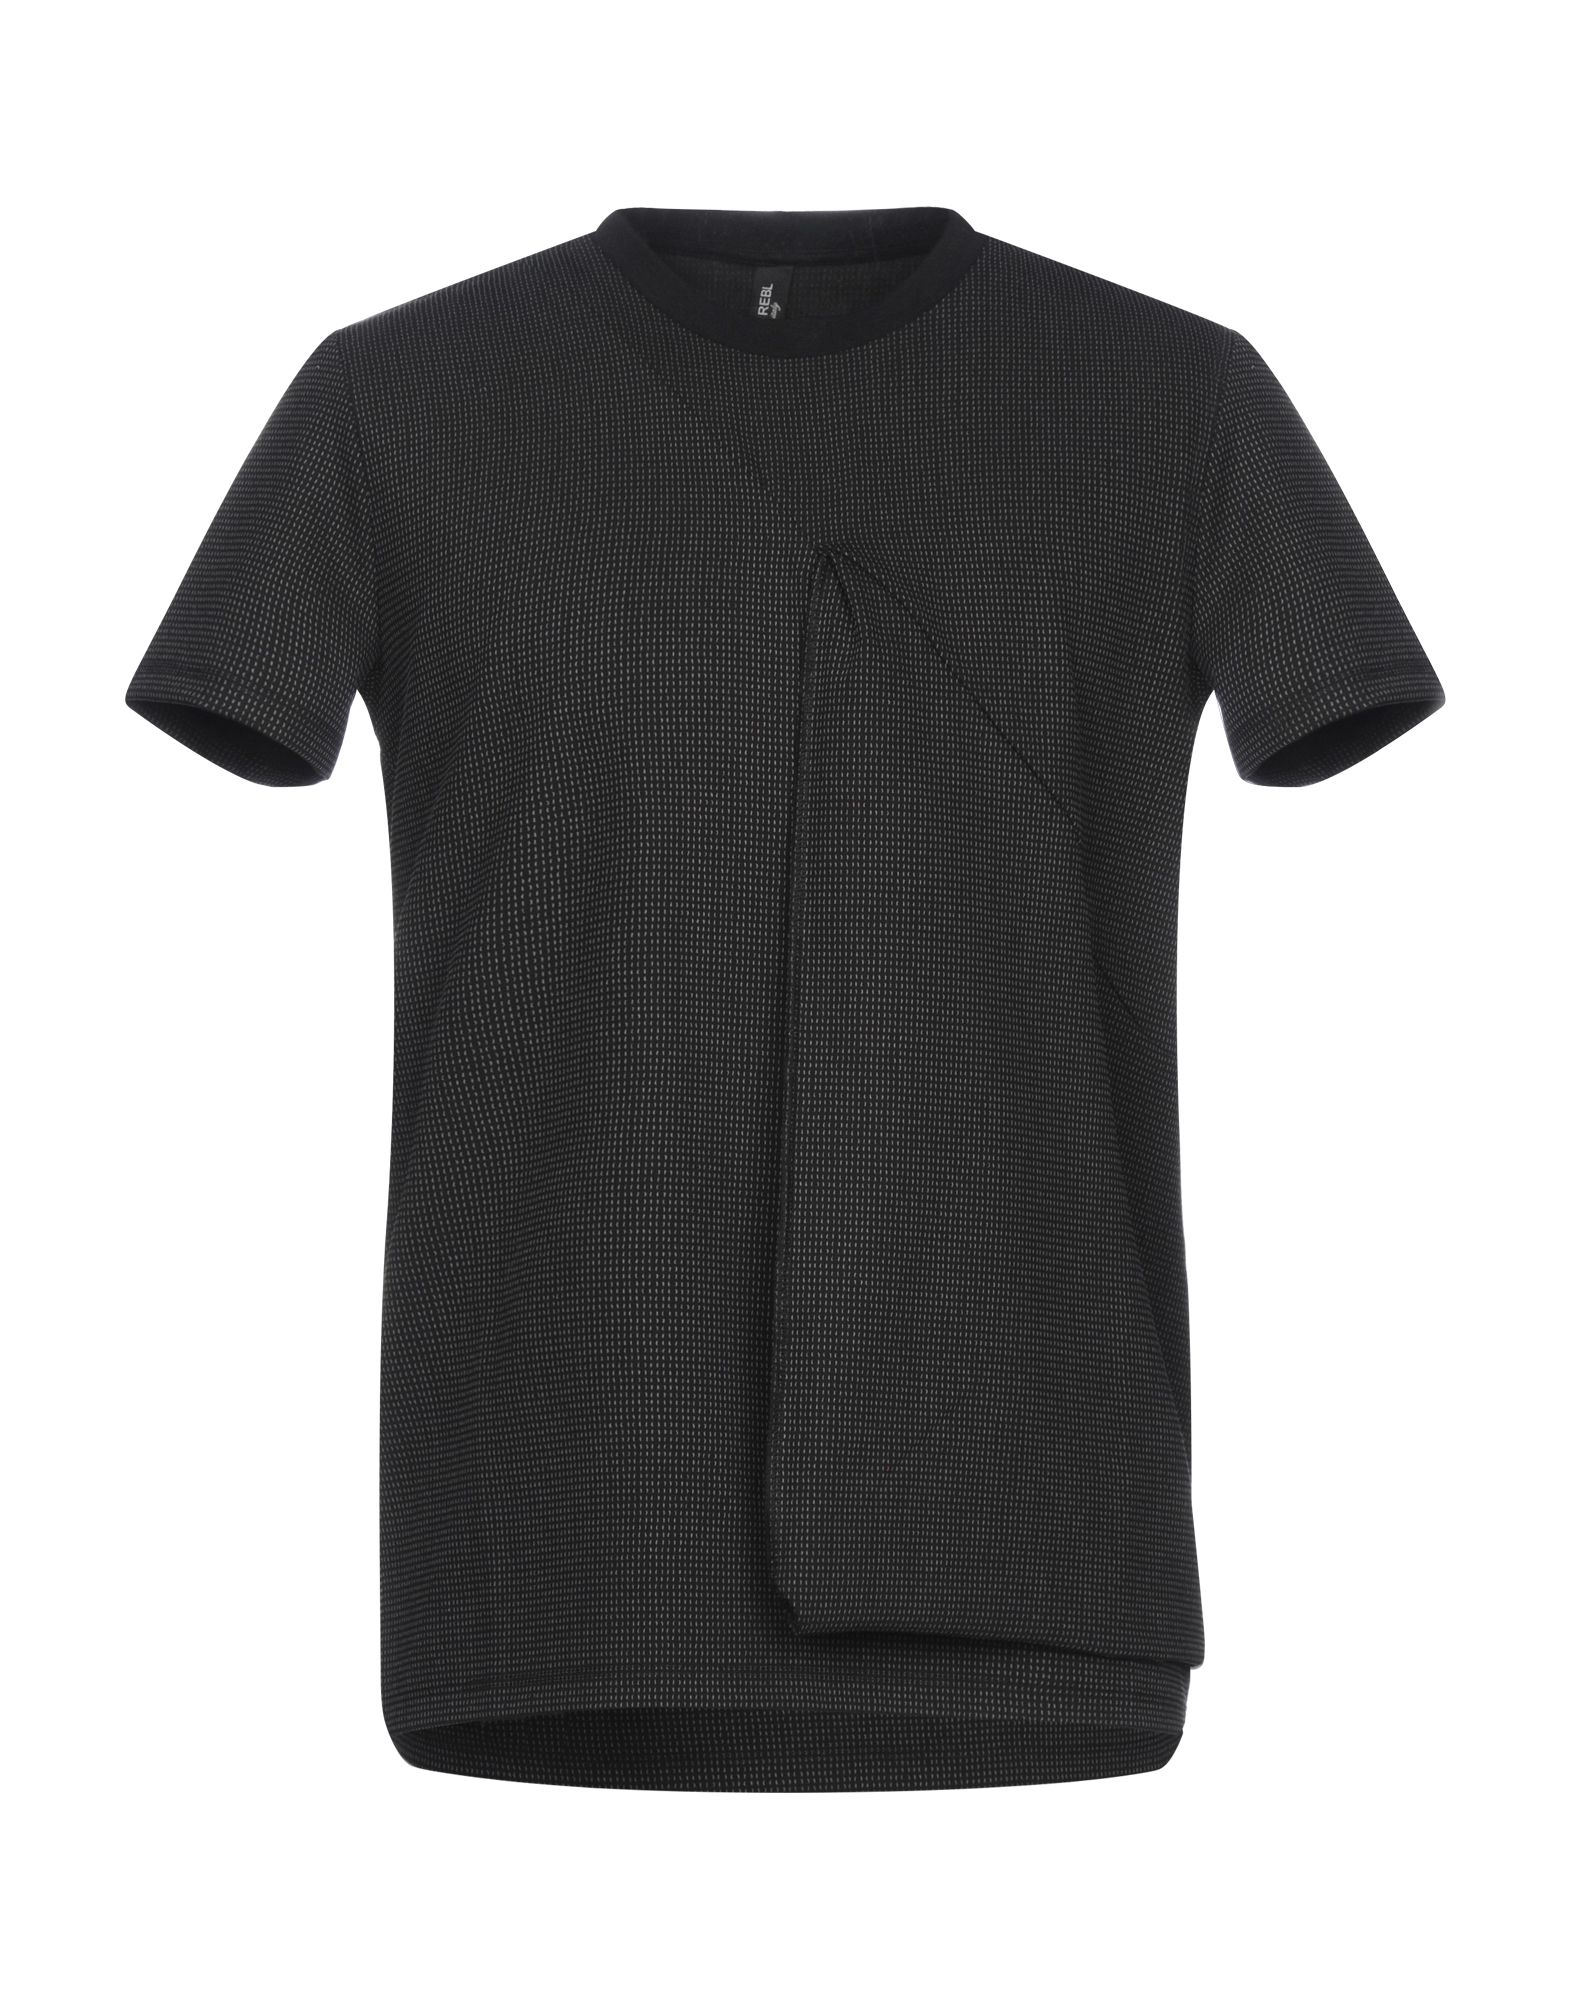 T-Shirt Tom Rebl Donna - Acquista online su